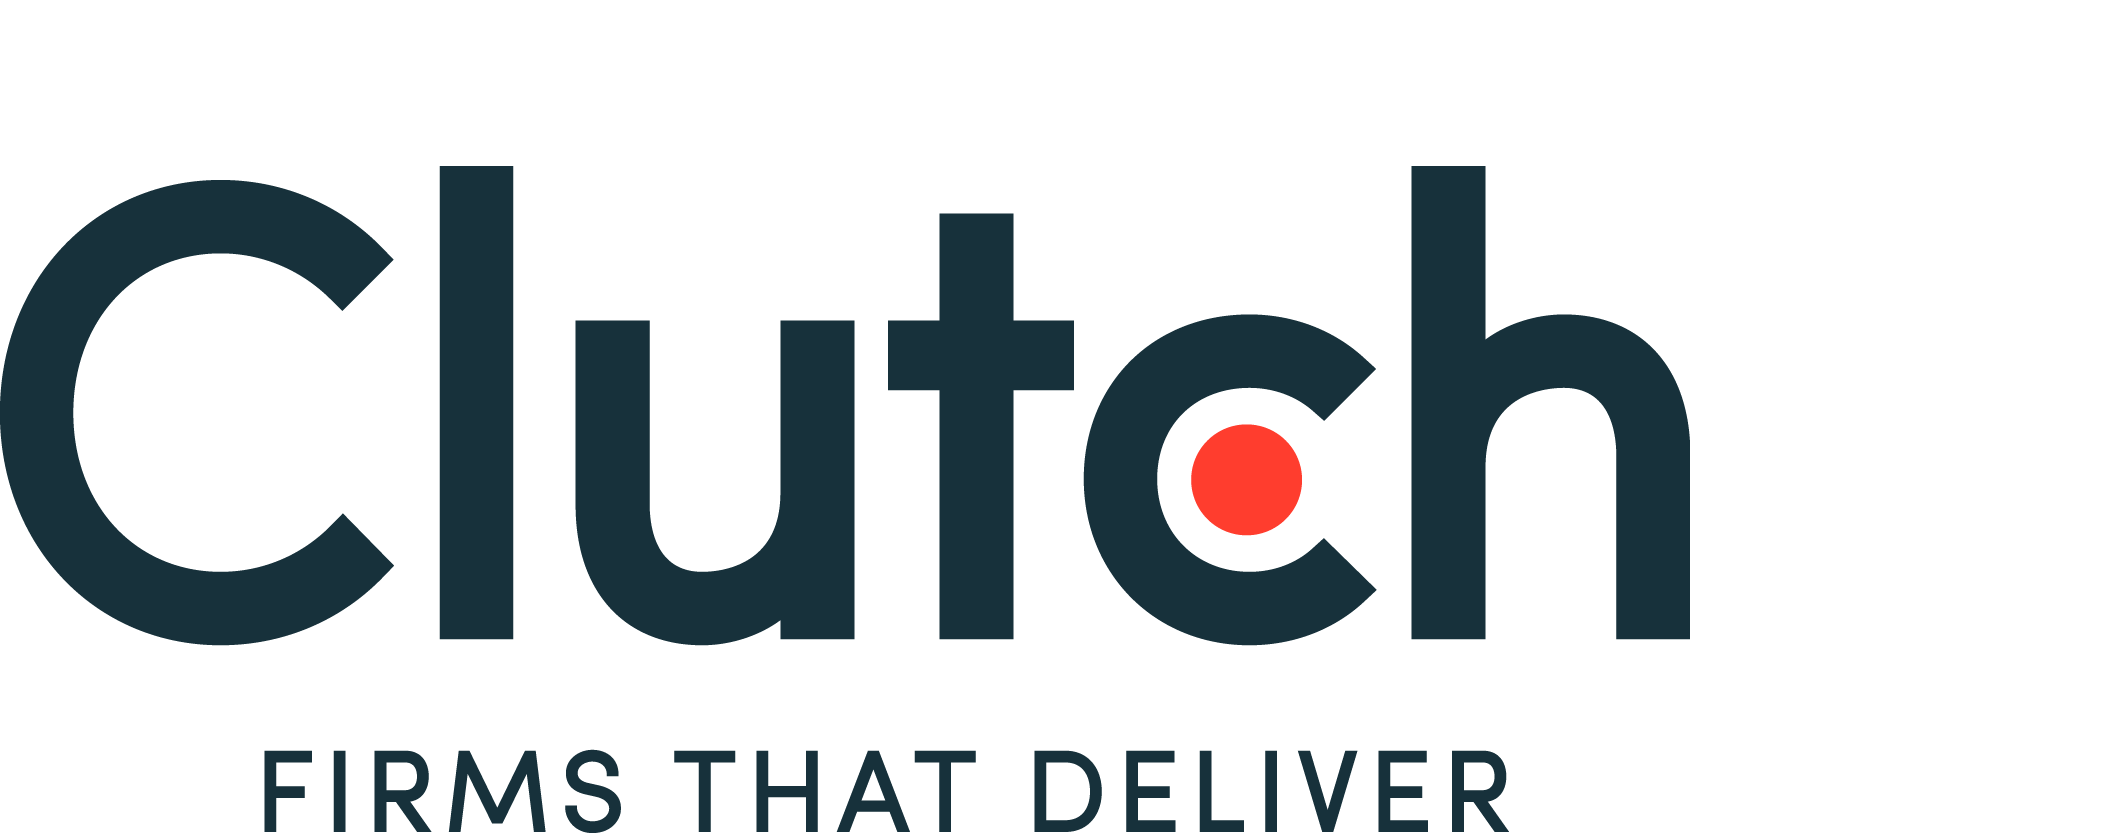 Clutch Publication Logo